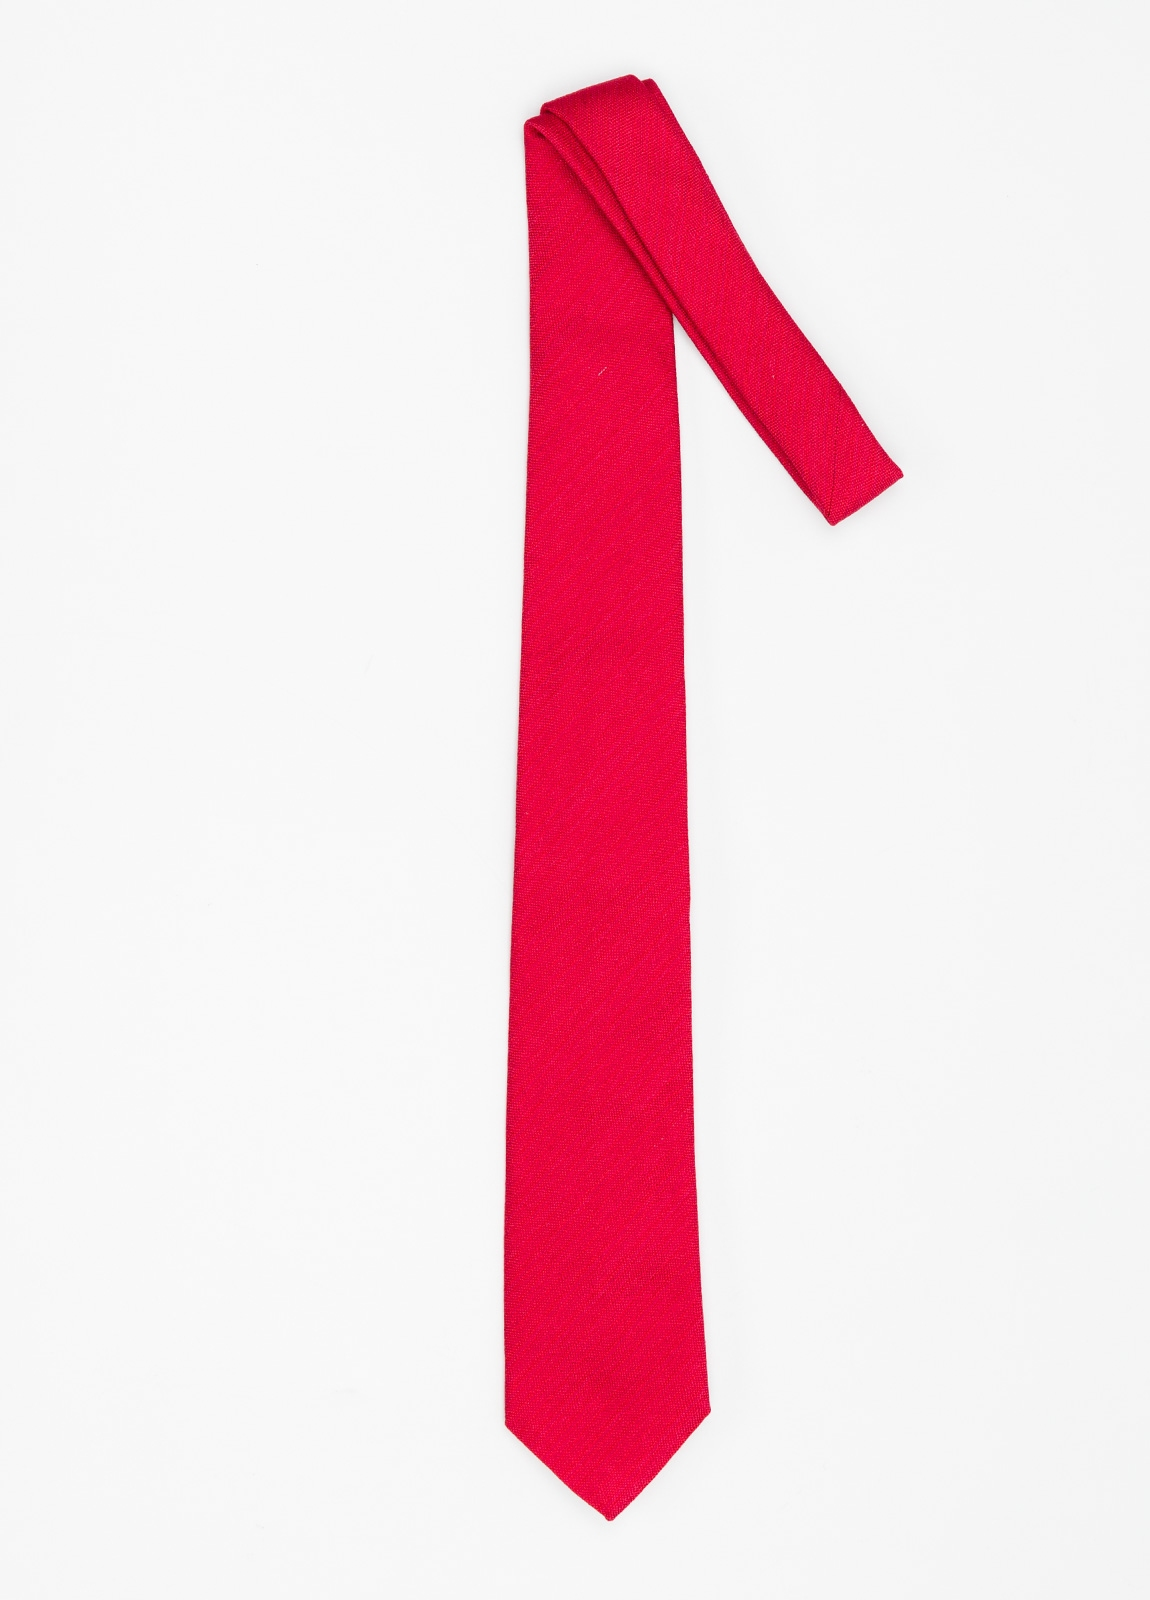 Corbata Formal Wear microtextura color rojo. Pala 7,5 cm. 96% Seda 4% Algodón. - Ítem1